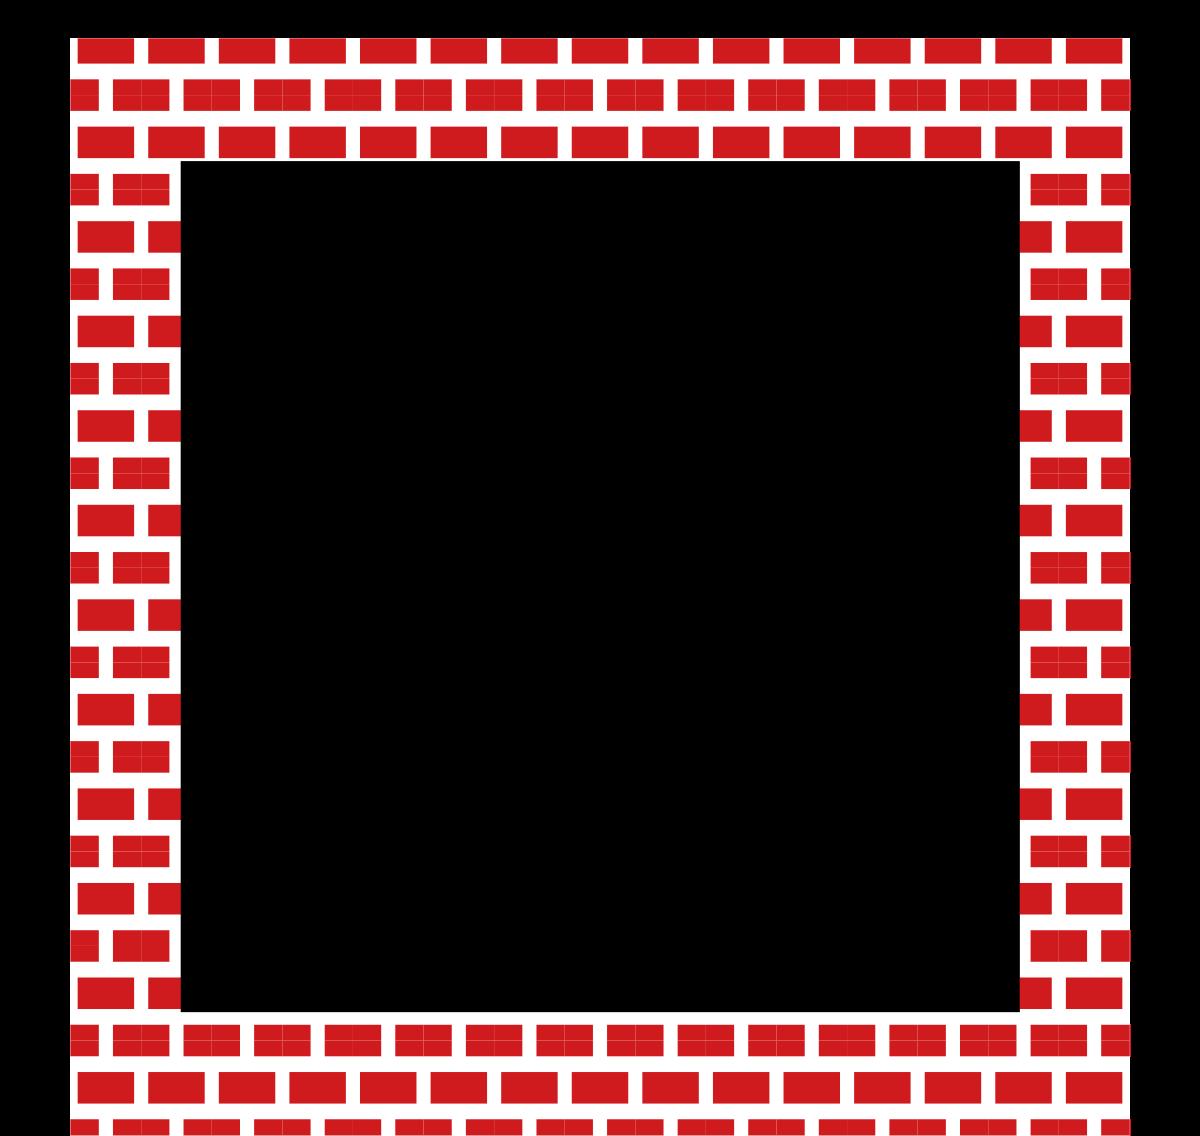 1200x1136 Jail Cell Clipart Chadholtz